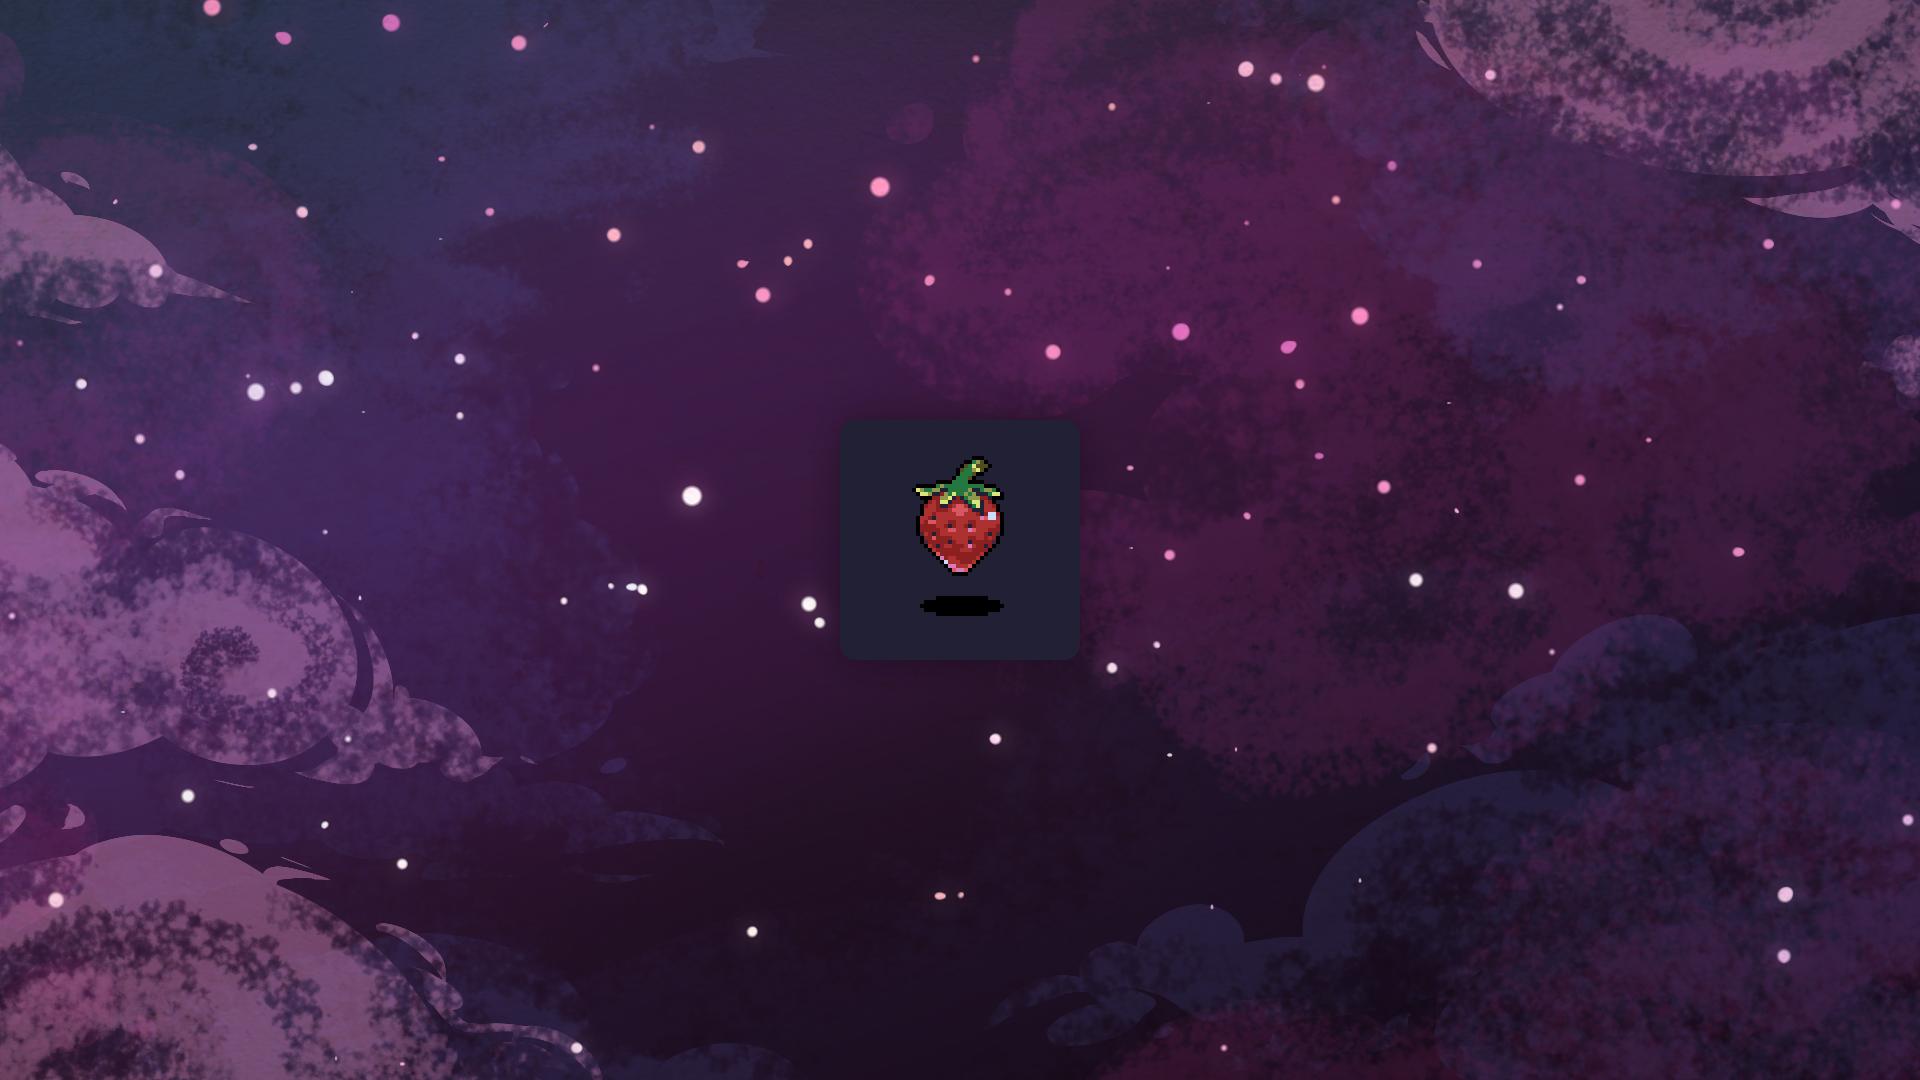 Strawberry Badge